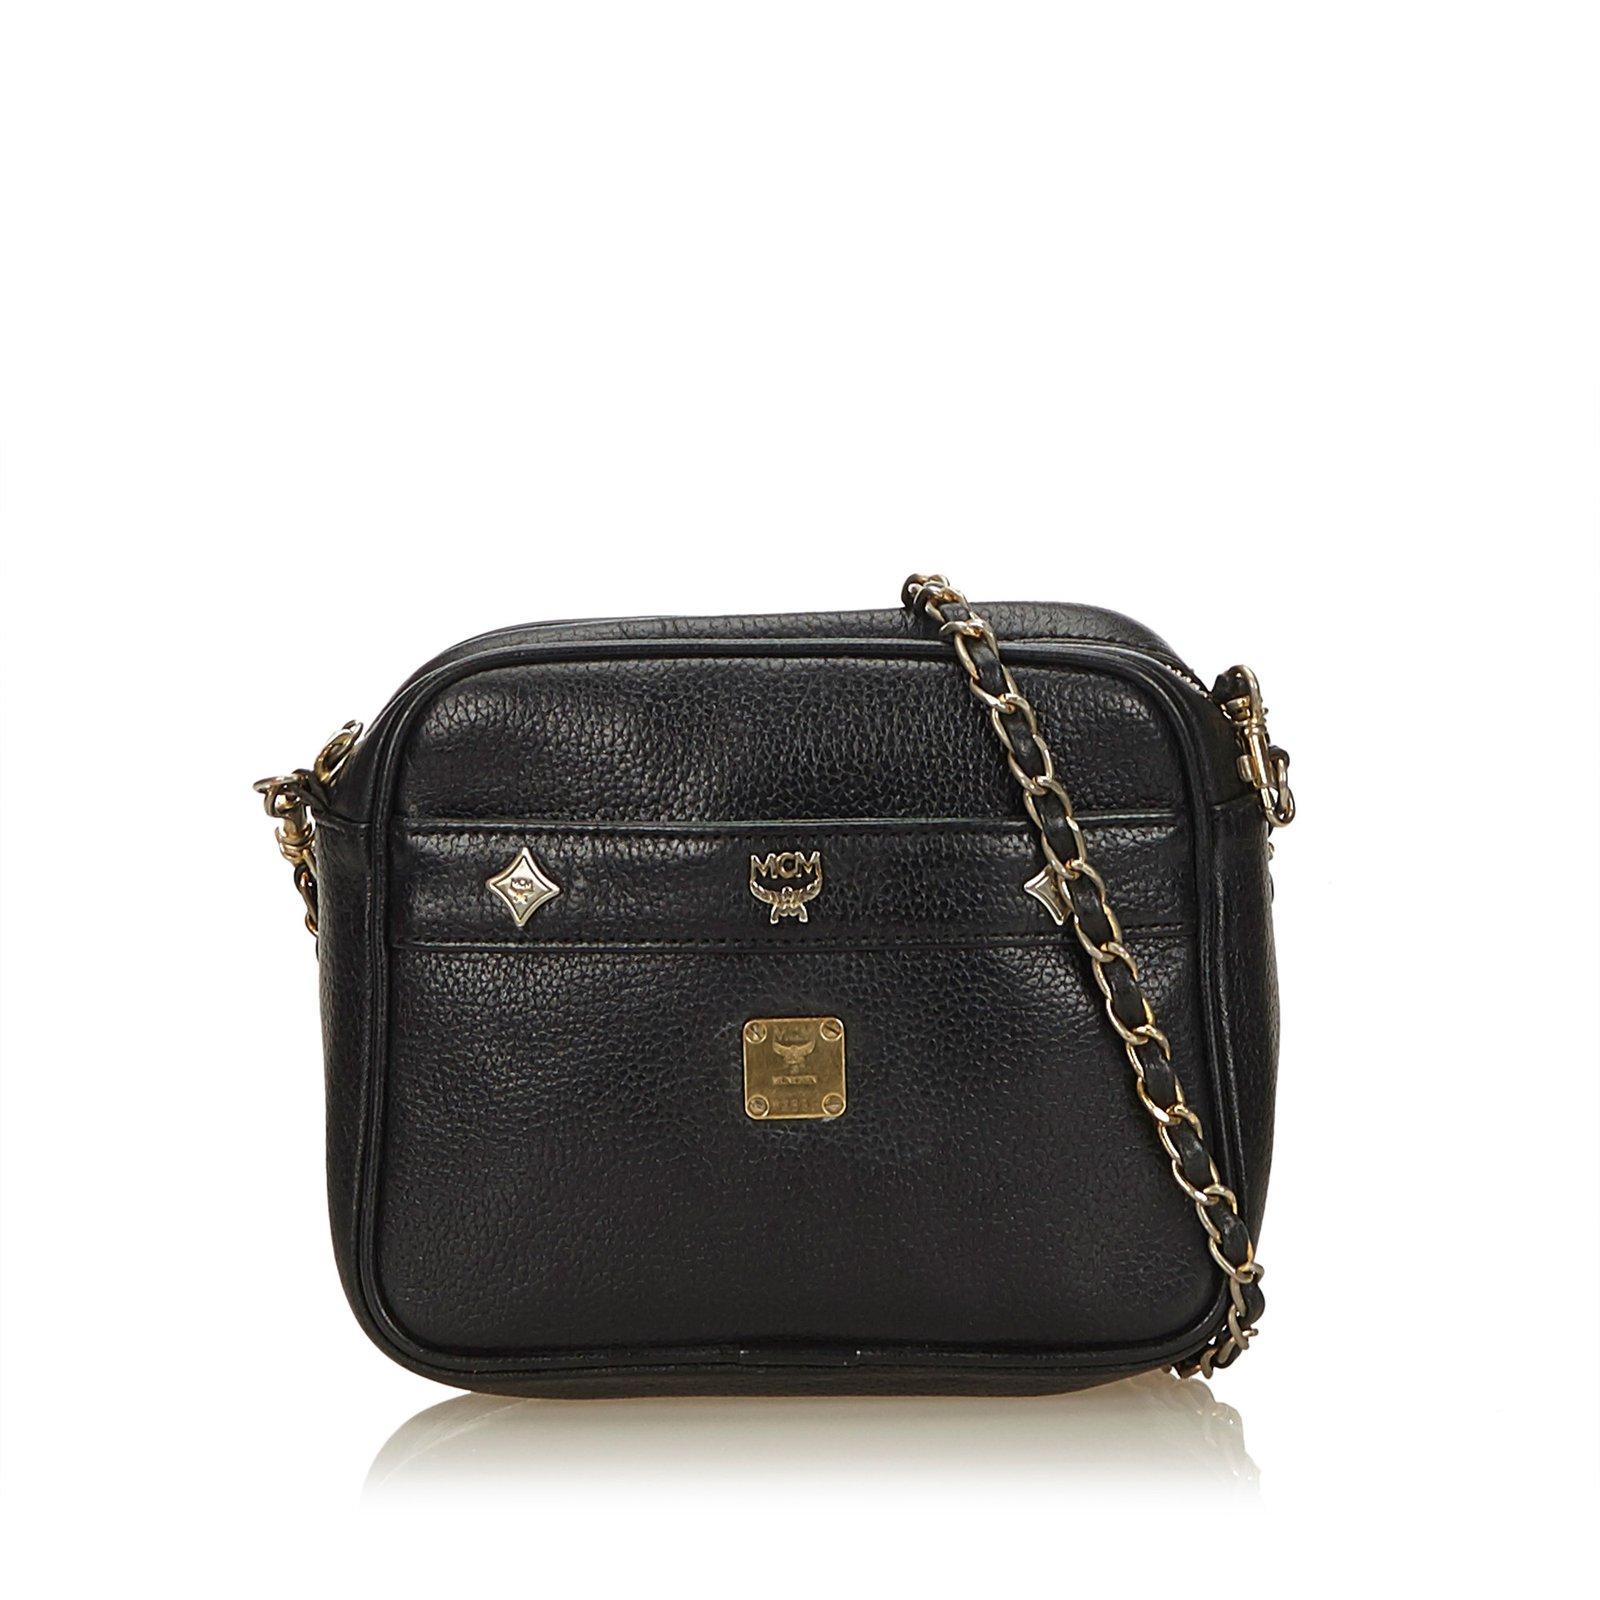 b4fee6273473 MCM Leather Chain Crossbody Bag Handbags Leather,Other Black ref.100134